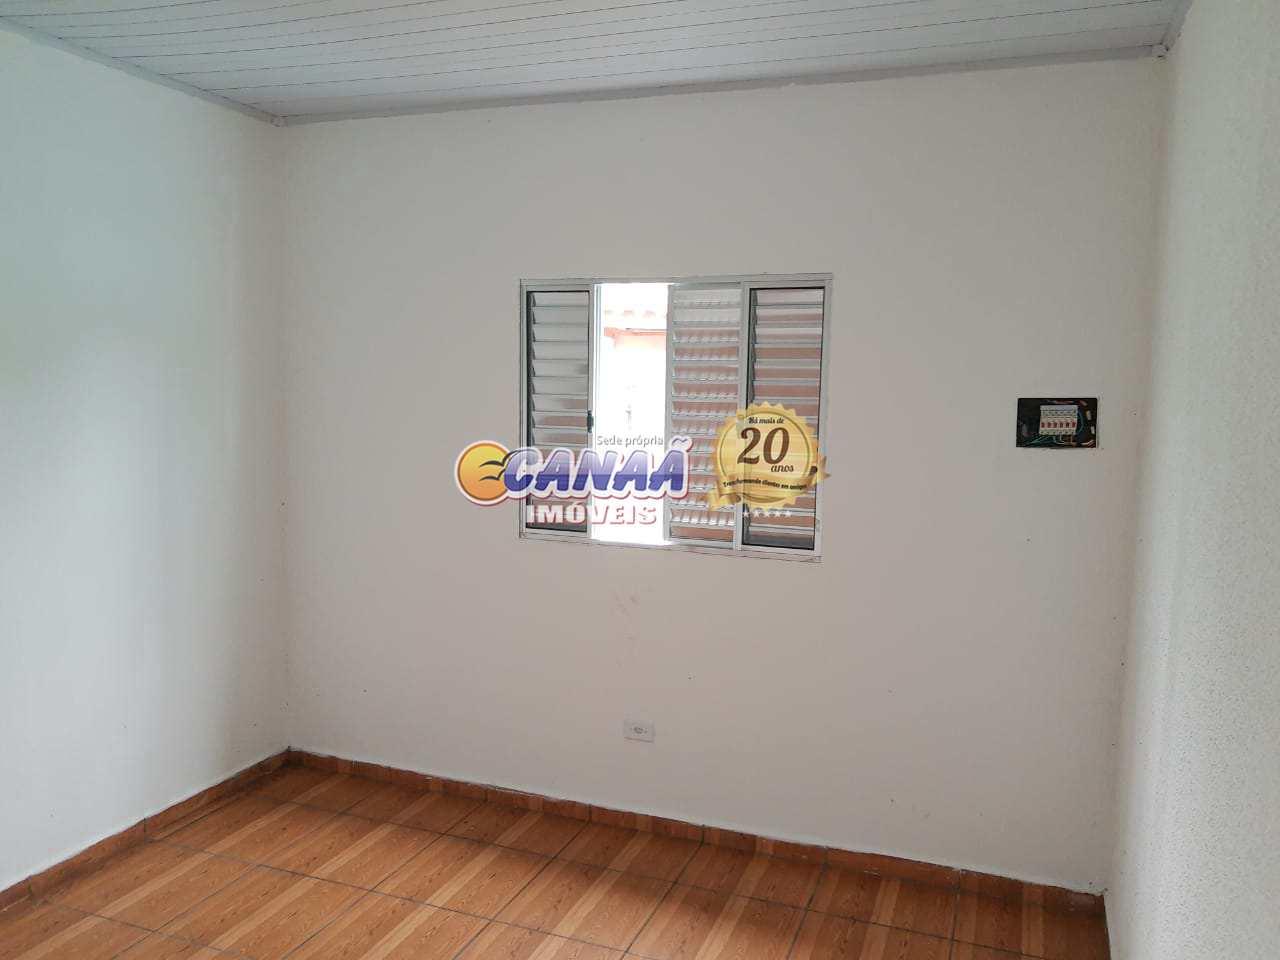 Casa com 2 dorms, Jardim Leonor, Mongaguá - R$ 174 mil, Cod: 8011